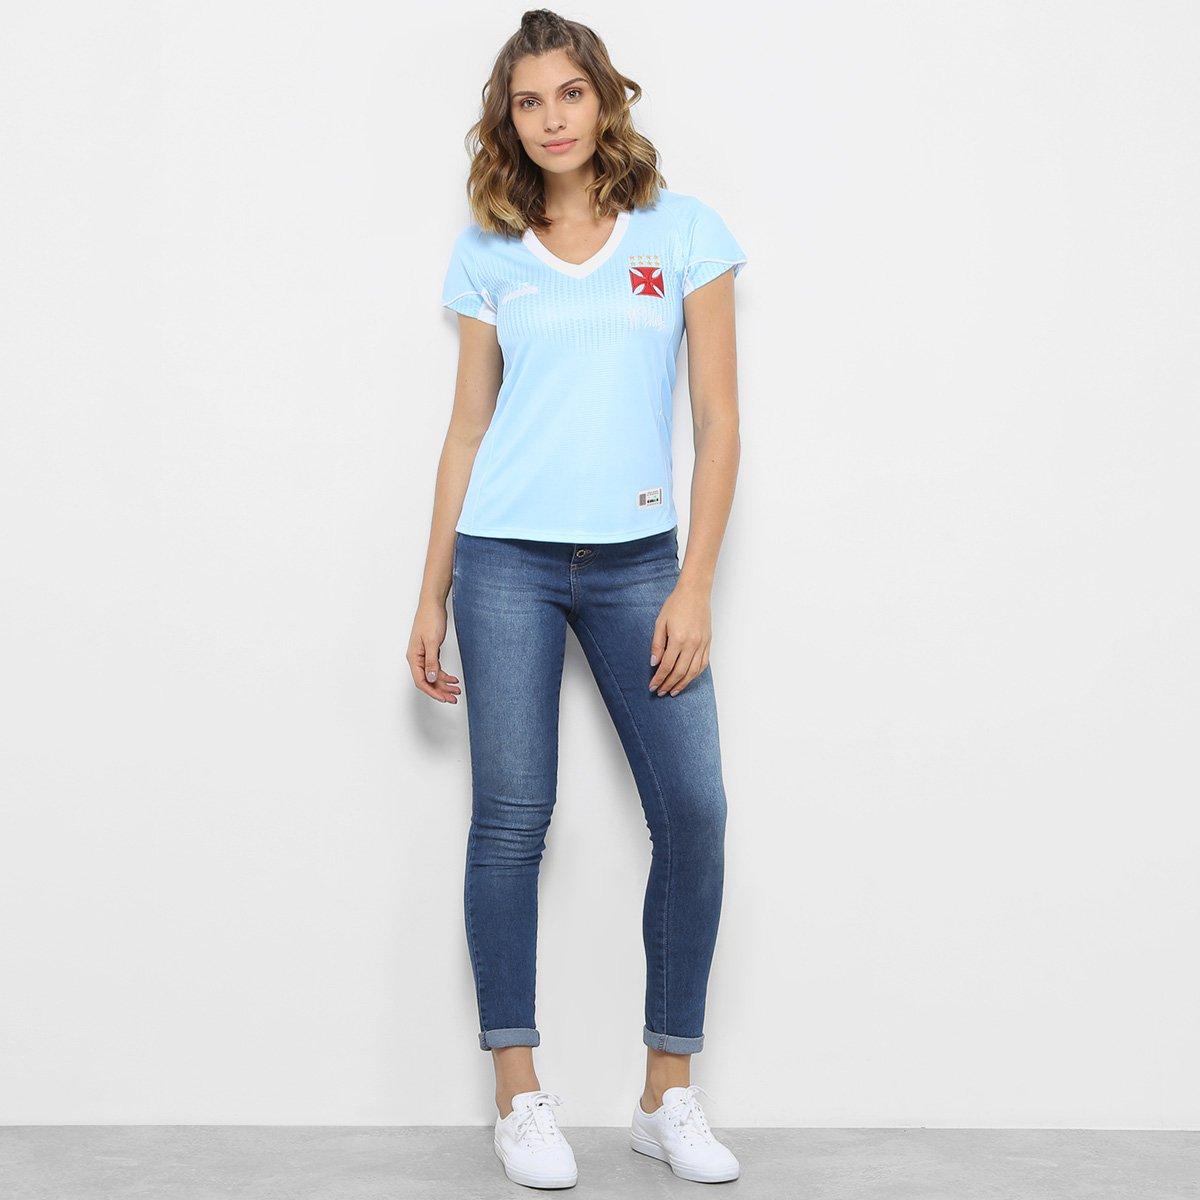 Camisa de Goleiro Vasco I 2018 s n° Torcedor Diadora Feminina - Azul ... f08ae21b02cff